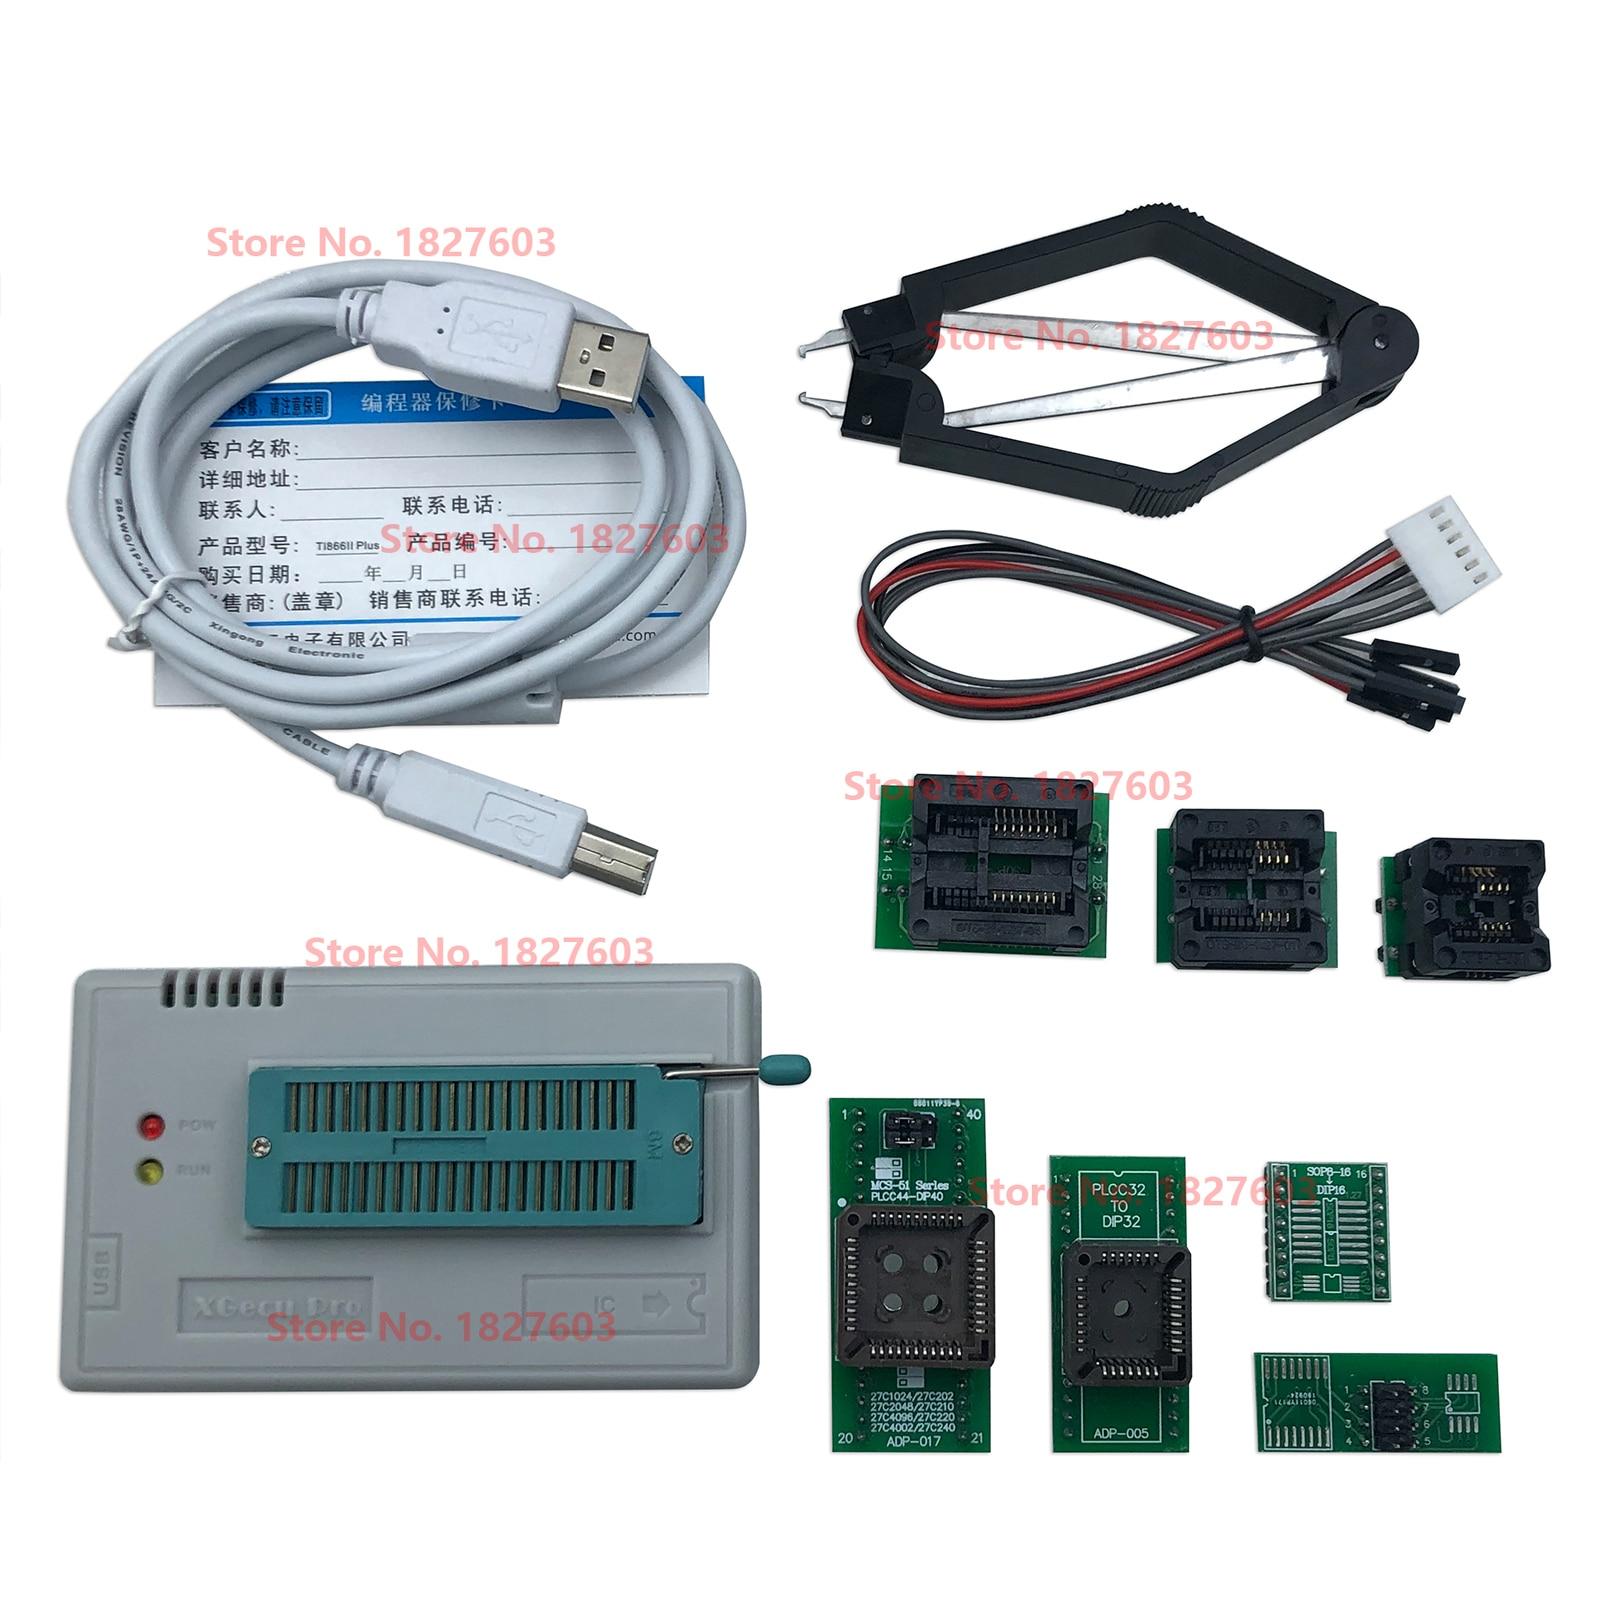 V11.50 XGecu TL866II زائد USB مبرمج دعم 17154 + IC + 7 قطعة محول SPI فلاش NAND EEPROM MCU PIC AVR استبدال TL866A